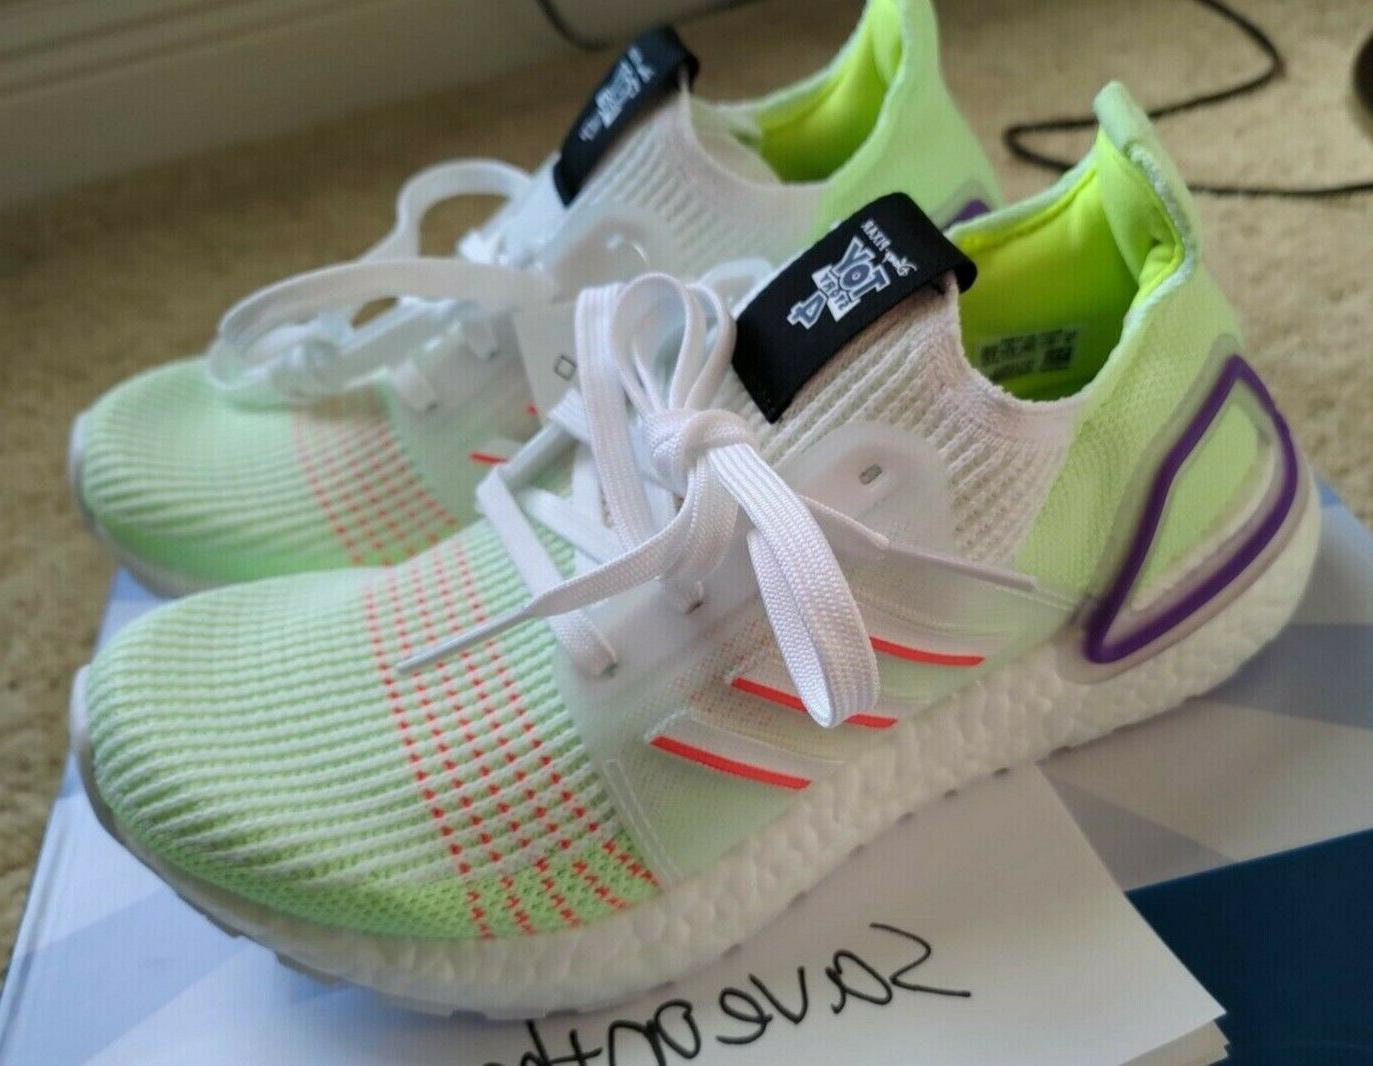 New Adidas Ultraboost Disney Buzz Shoes Kids Size GS